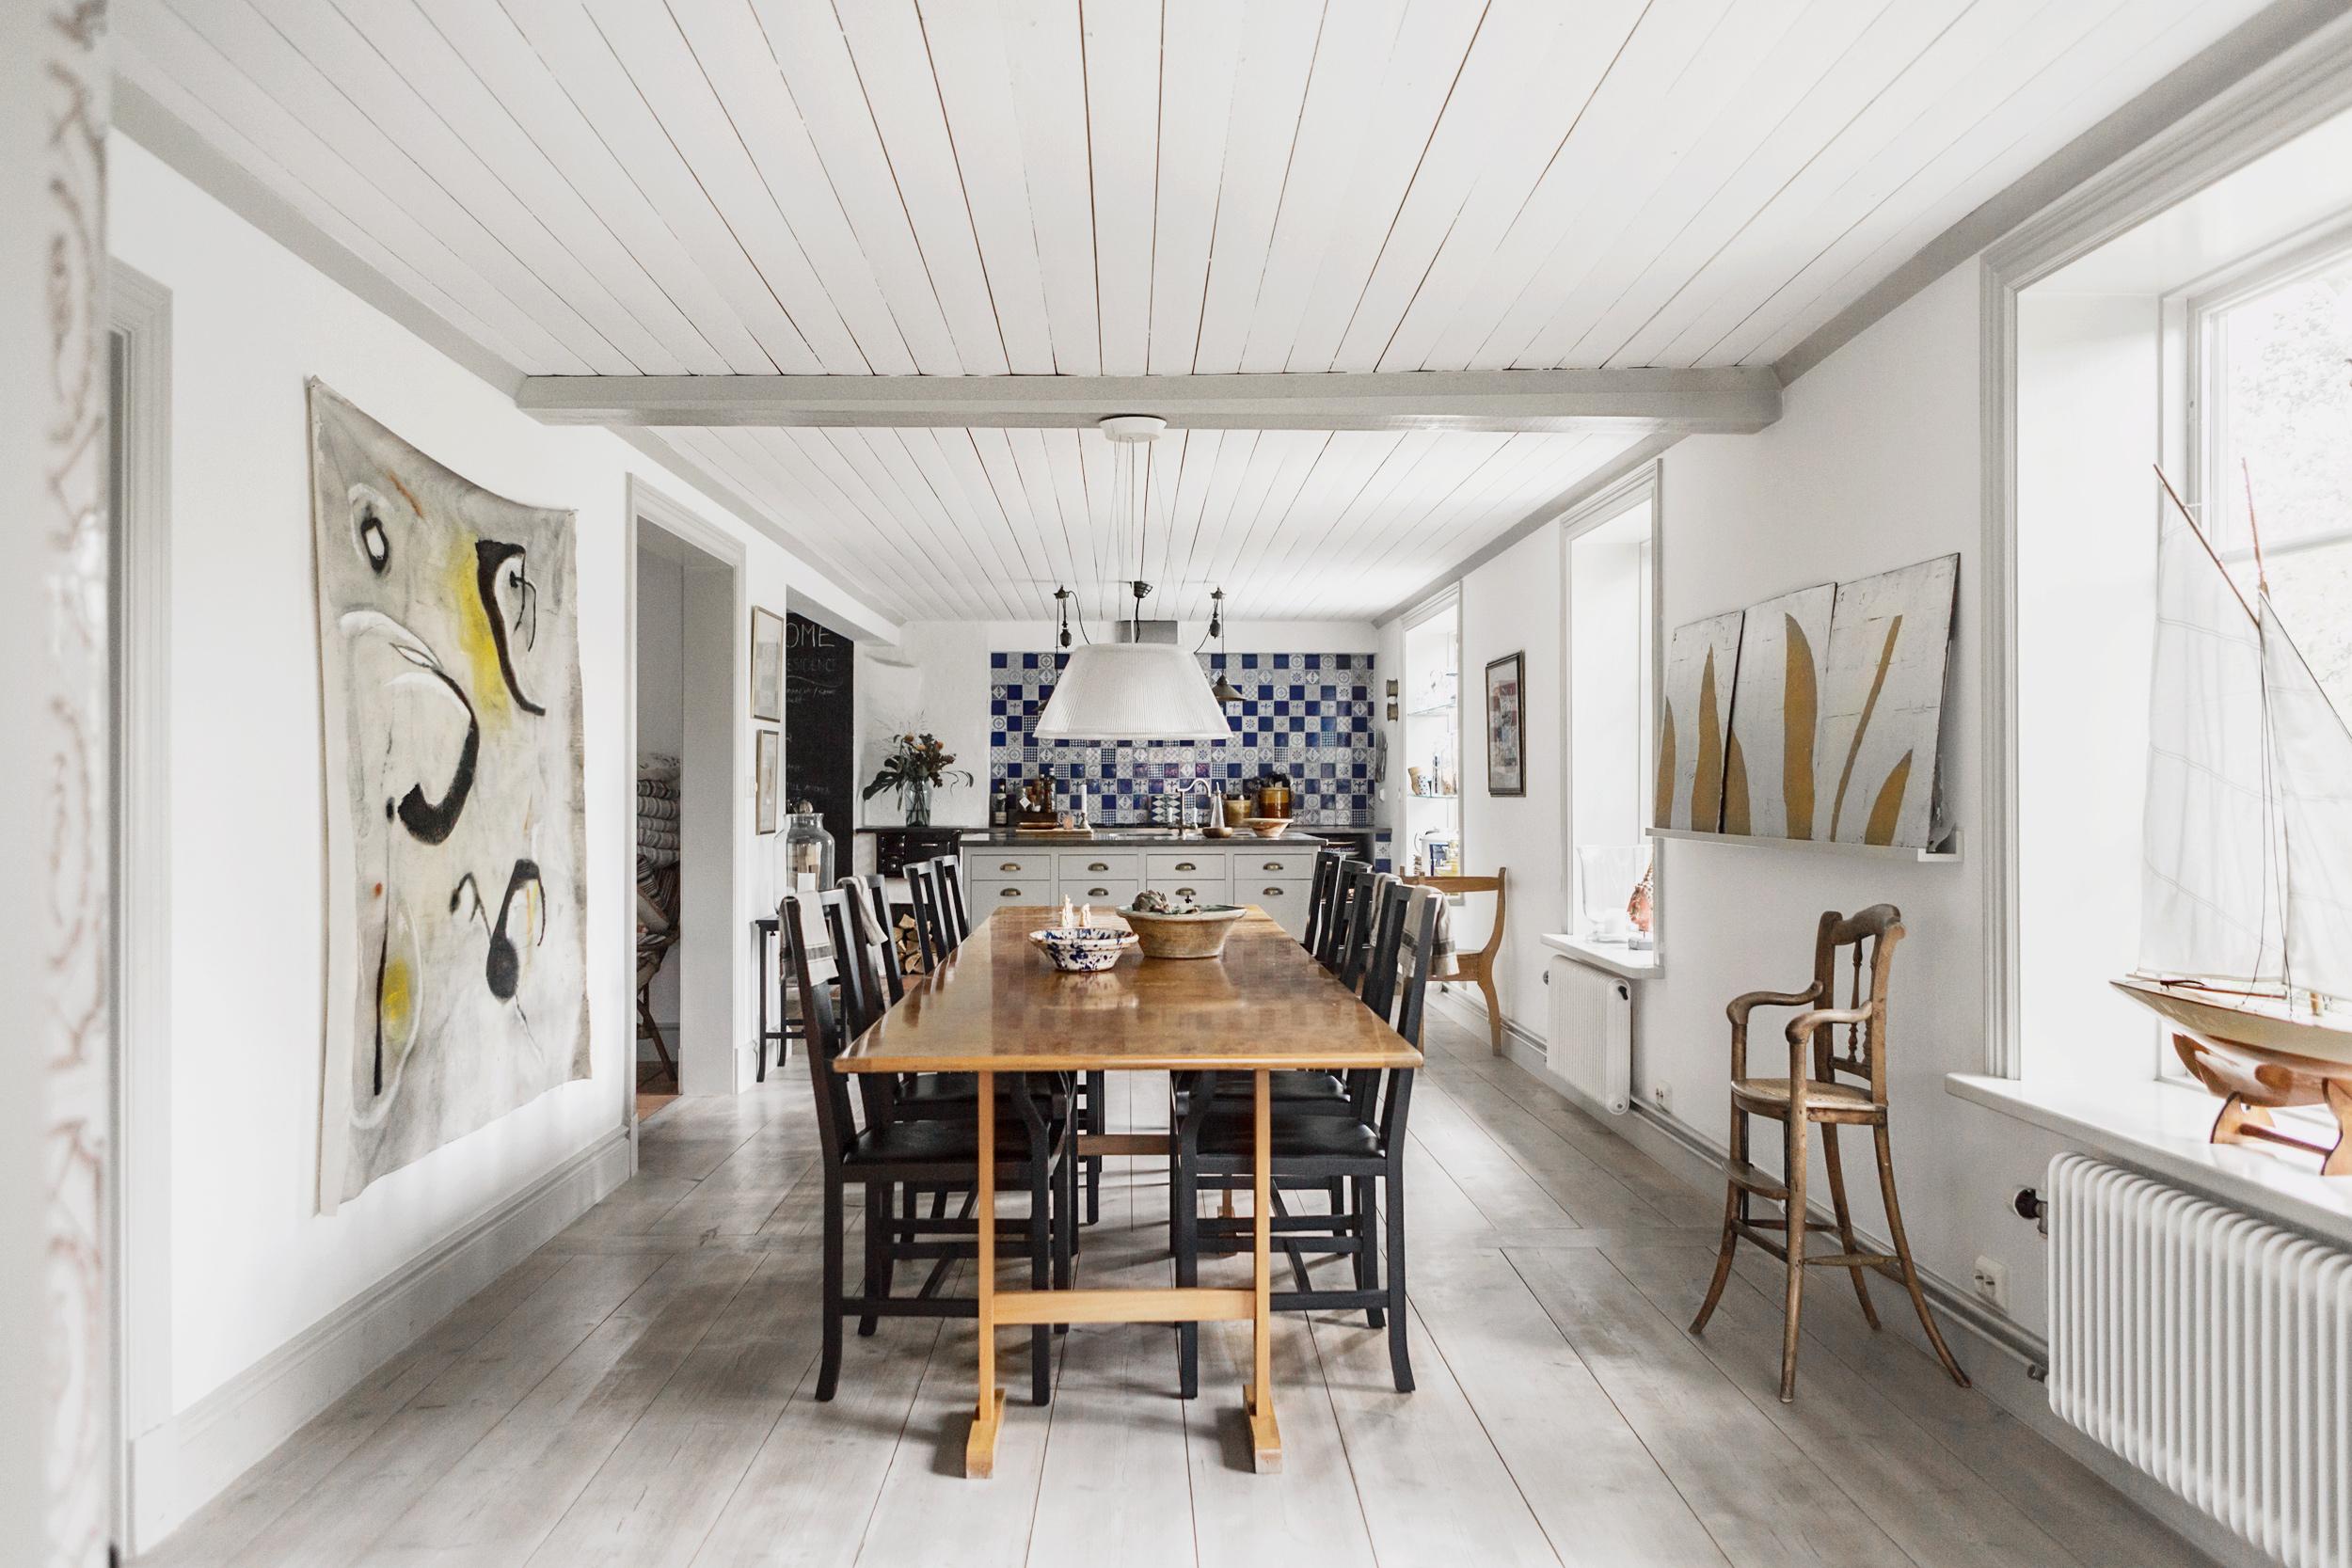 1700 tals hus i Nacka copyright 2017  Anna  Malmberg 4